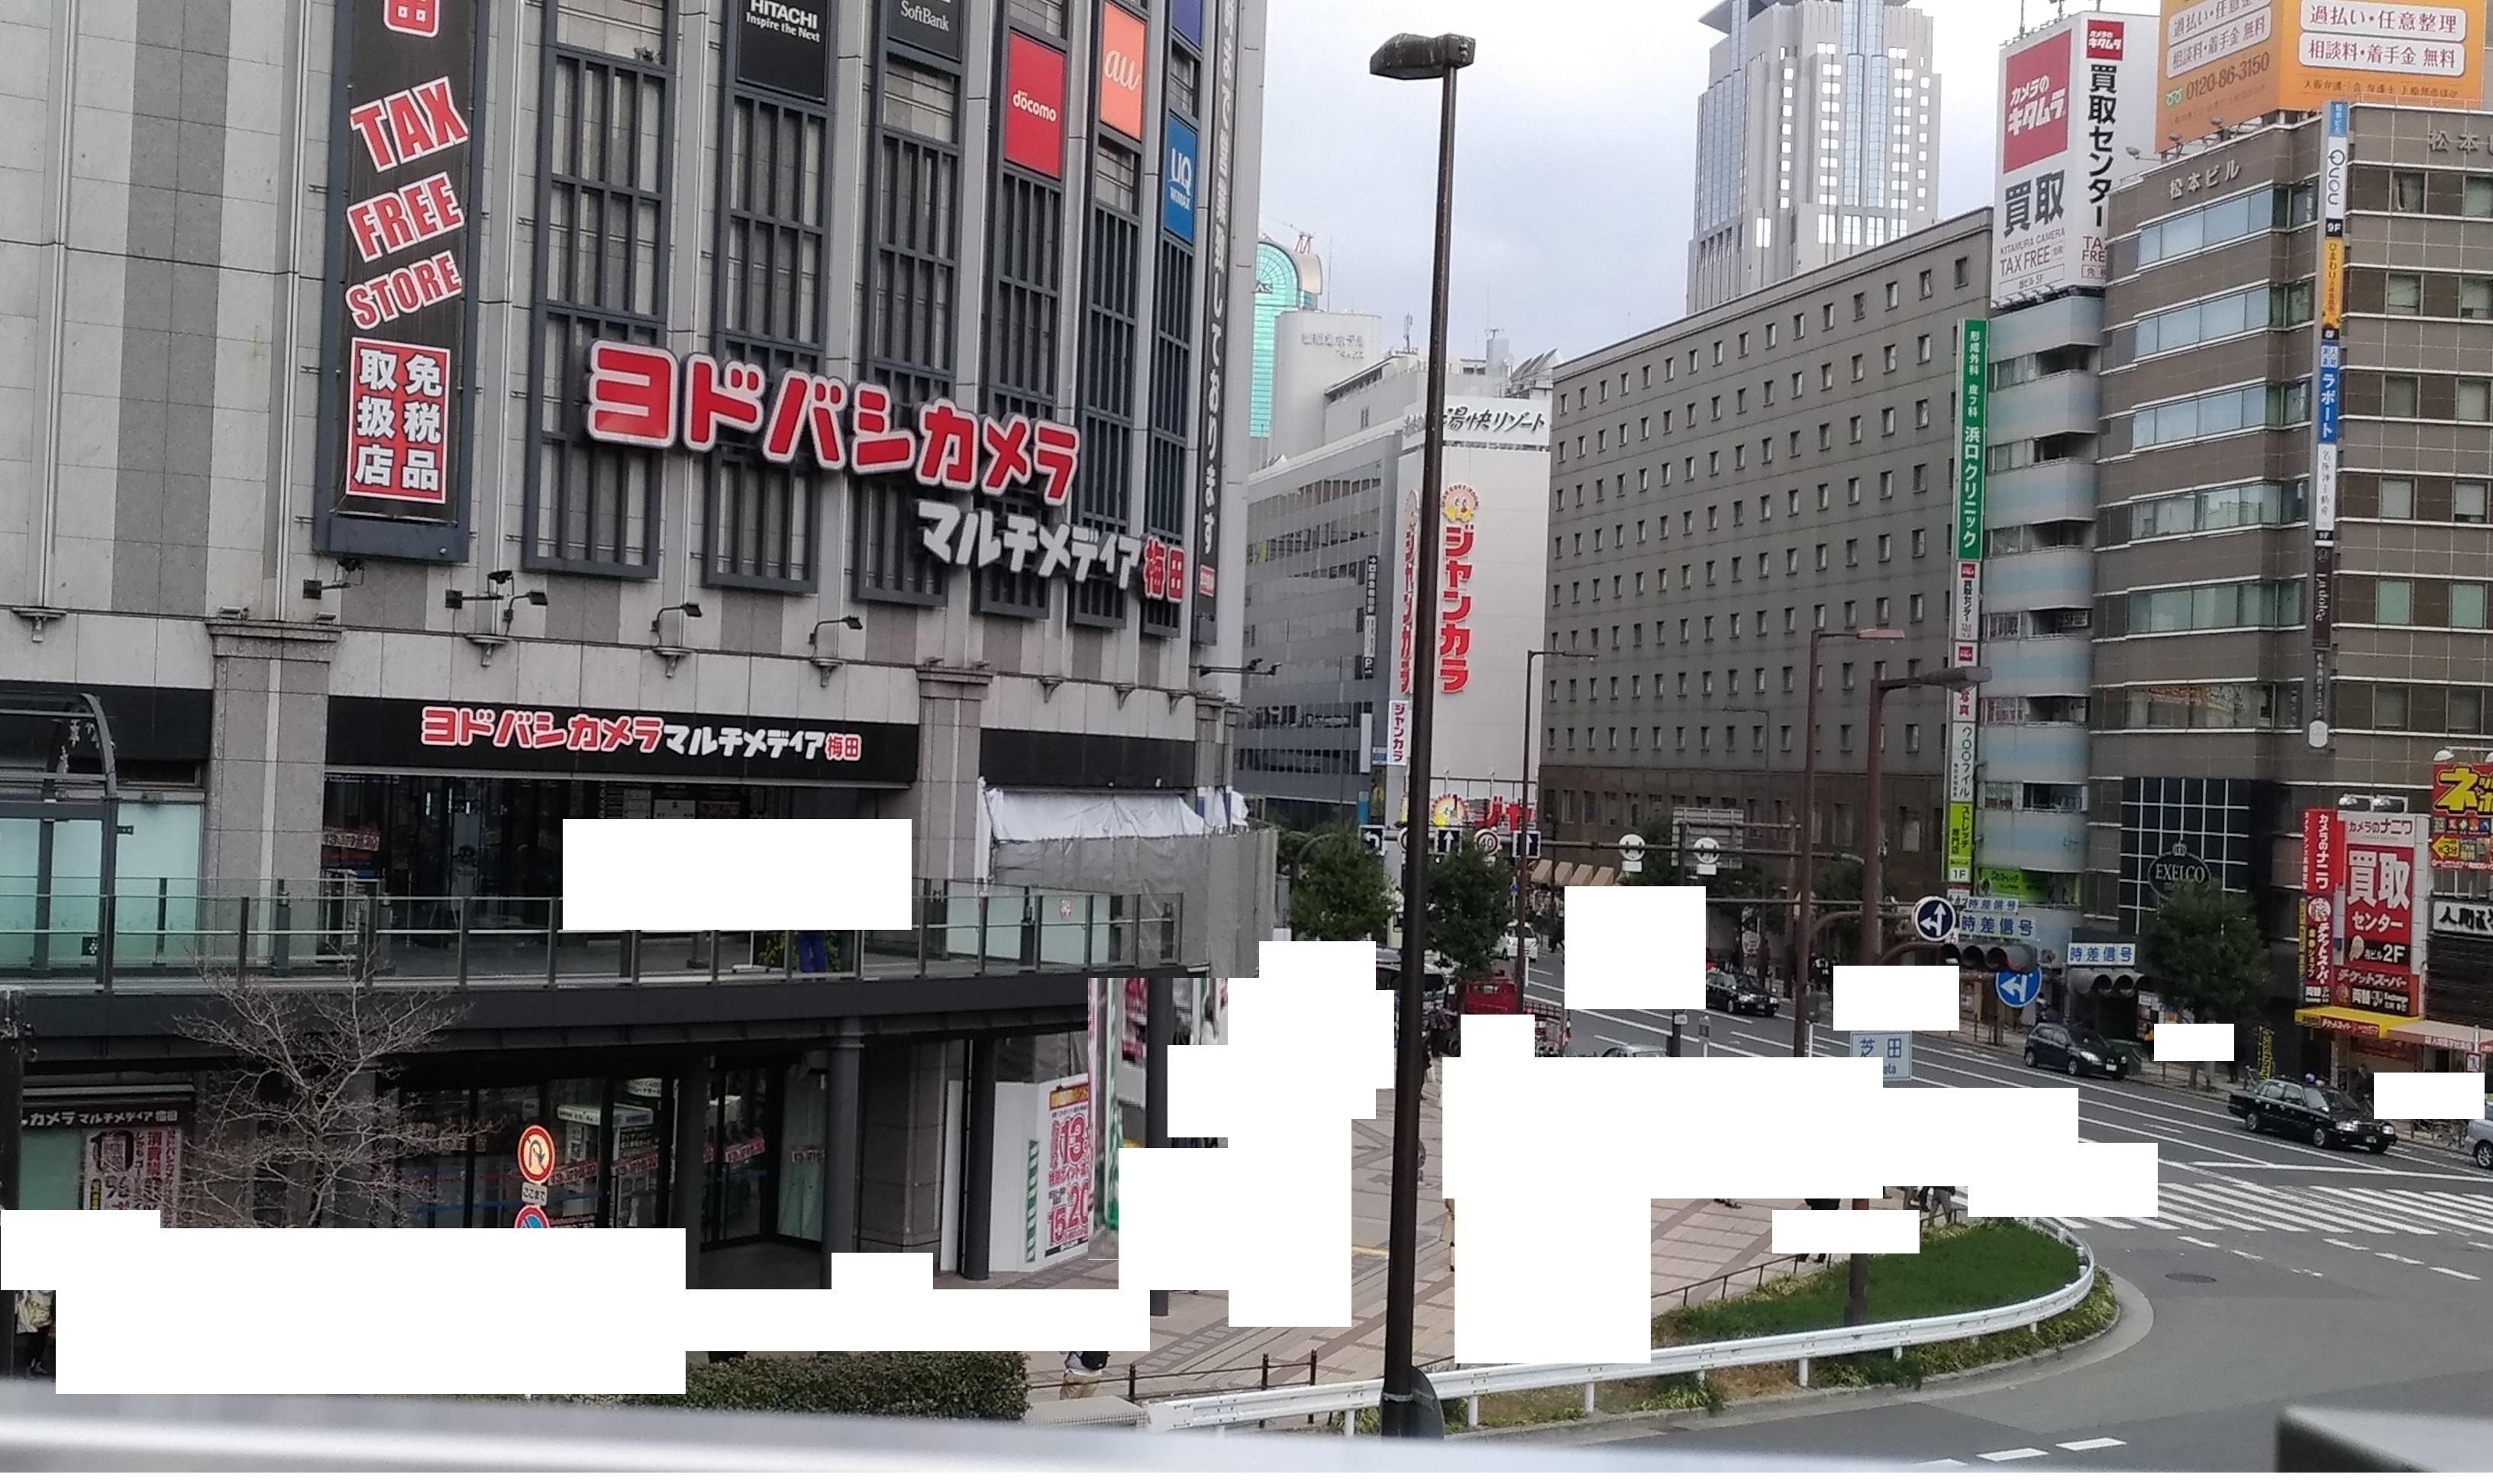 osaka_yodobashi_umeda_223_.jpg